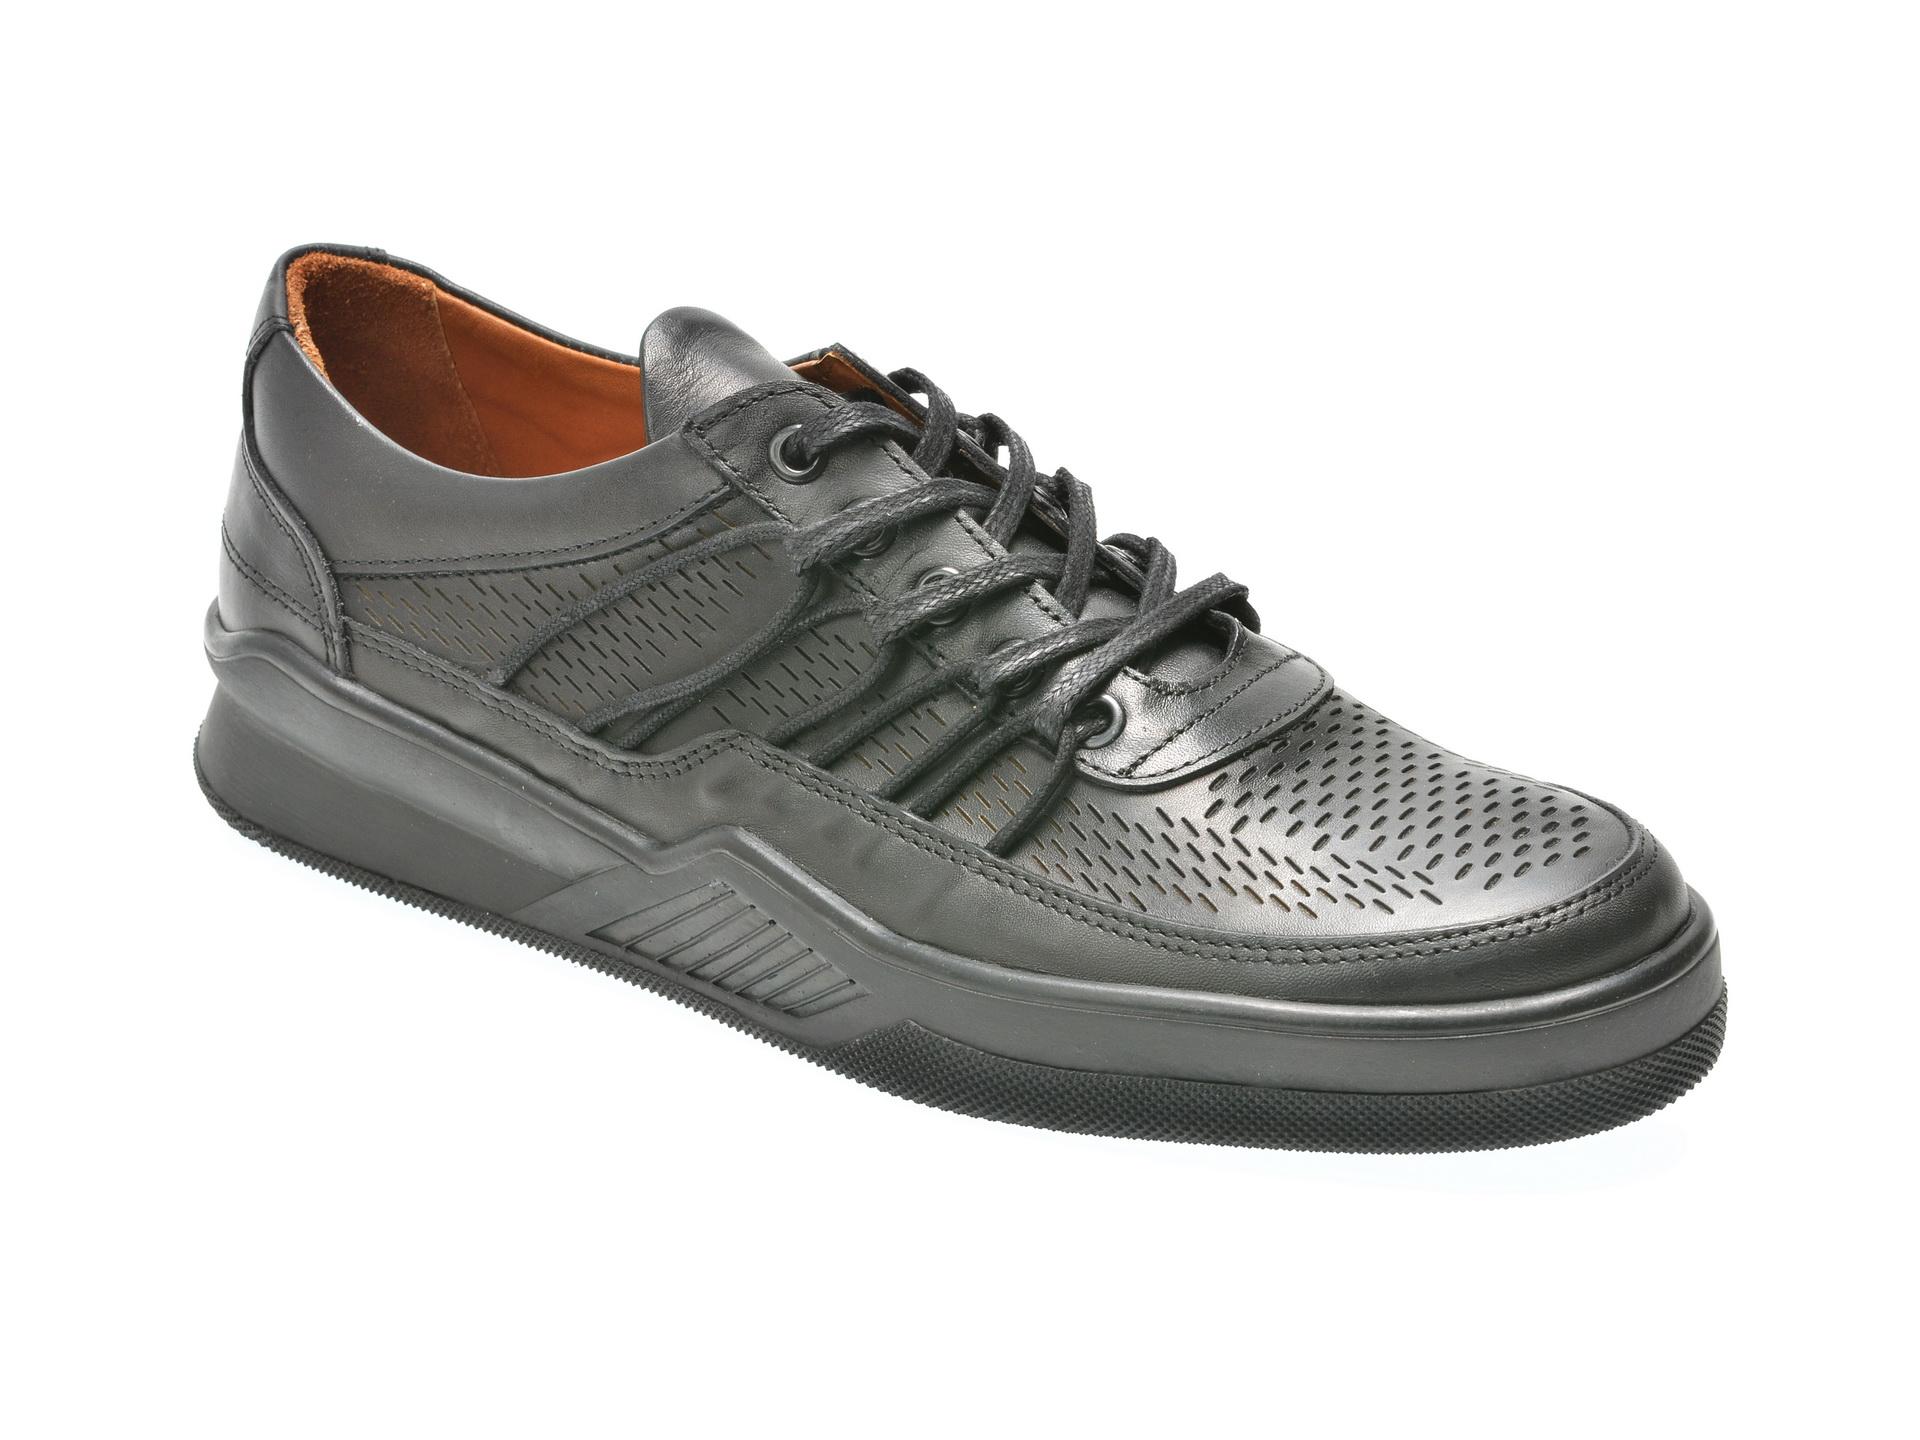 Pantofi OTTER negri, M4571, din piele naturala